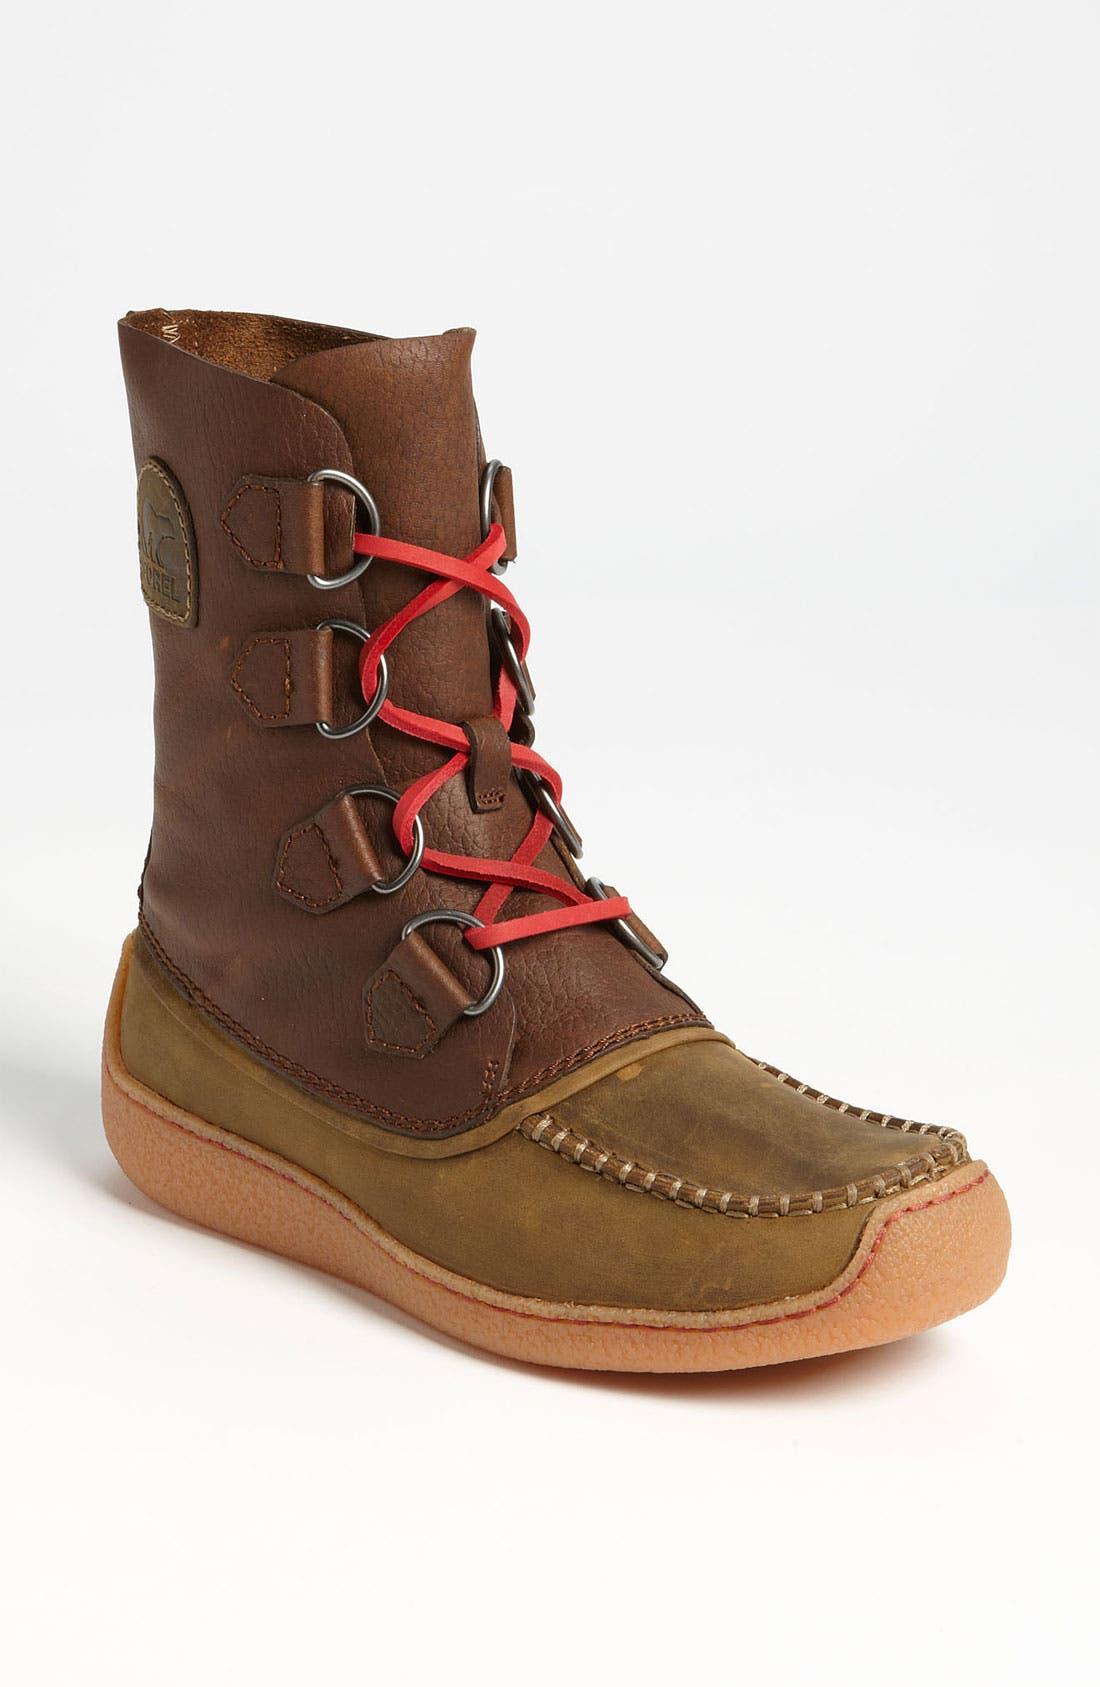 Alternate Image 1 Selected - SOREL 'Chugalug' Boot